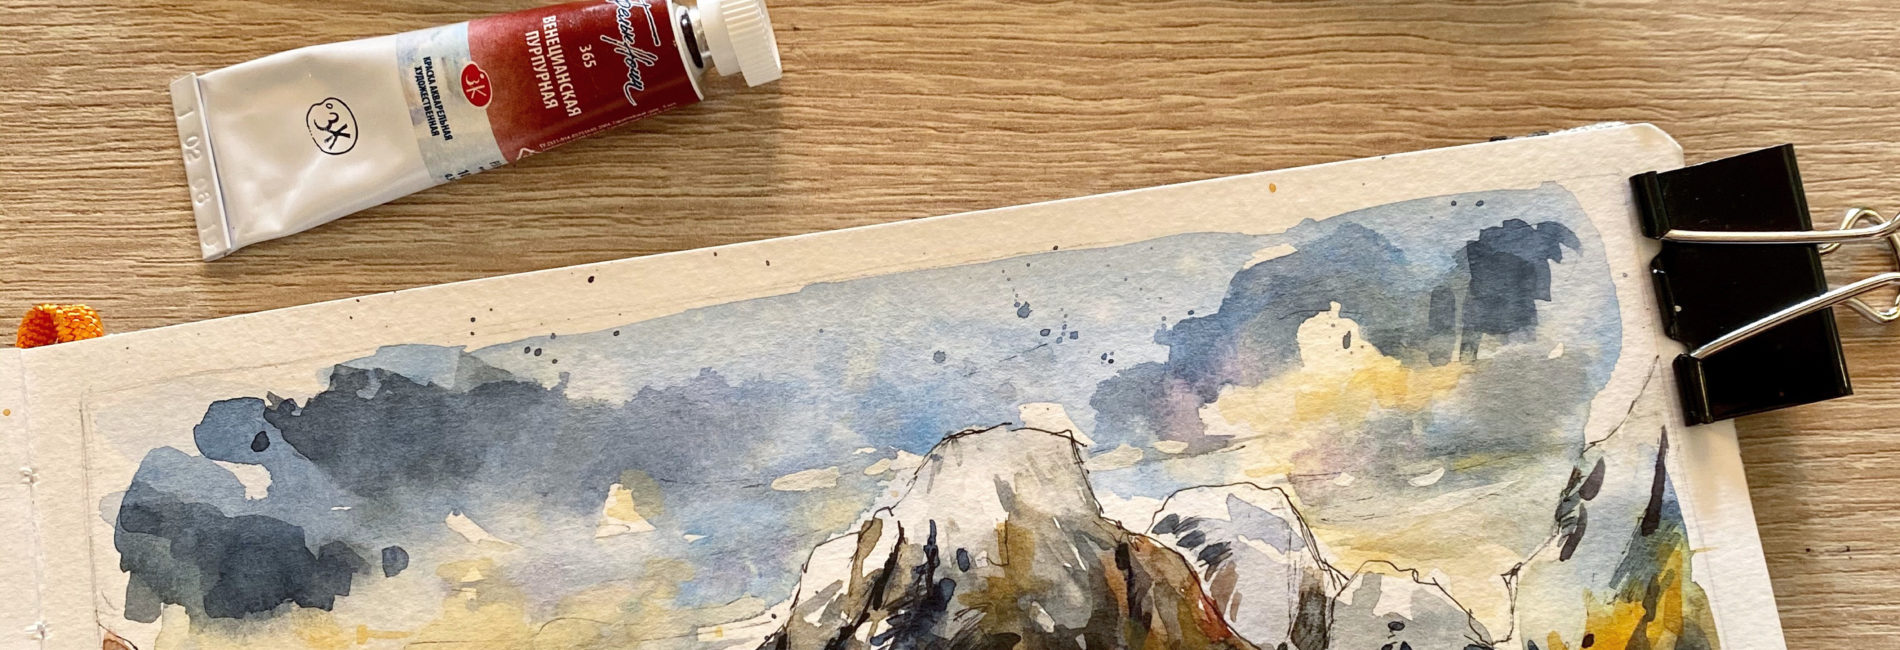 Reine's mountain – watercolor tutorial